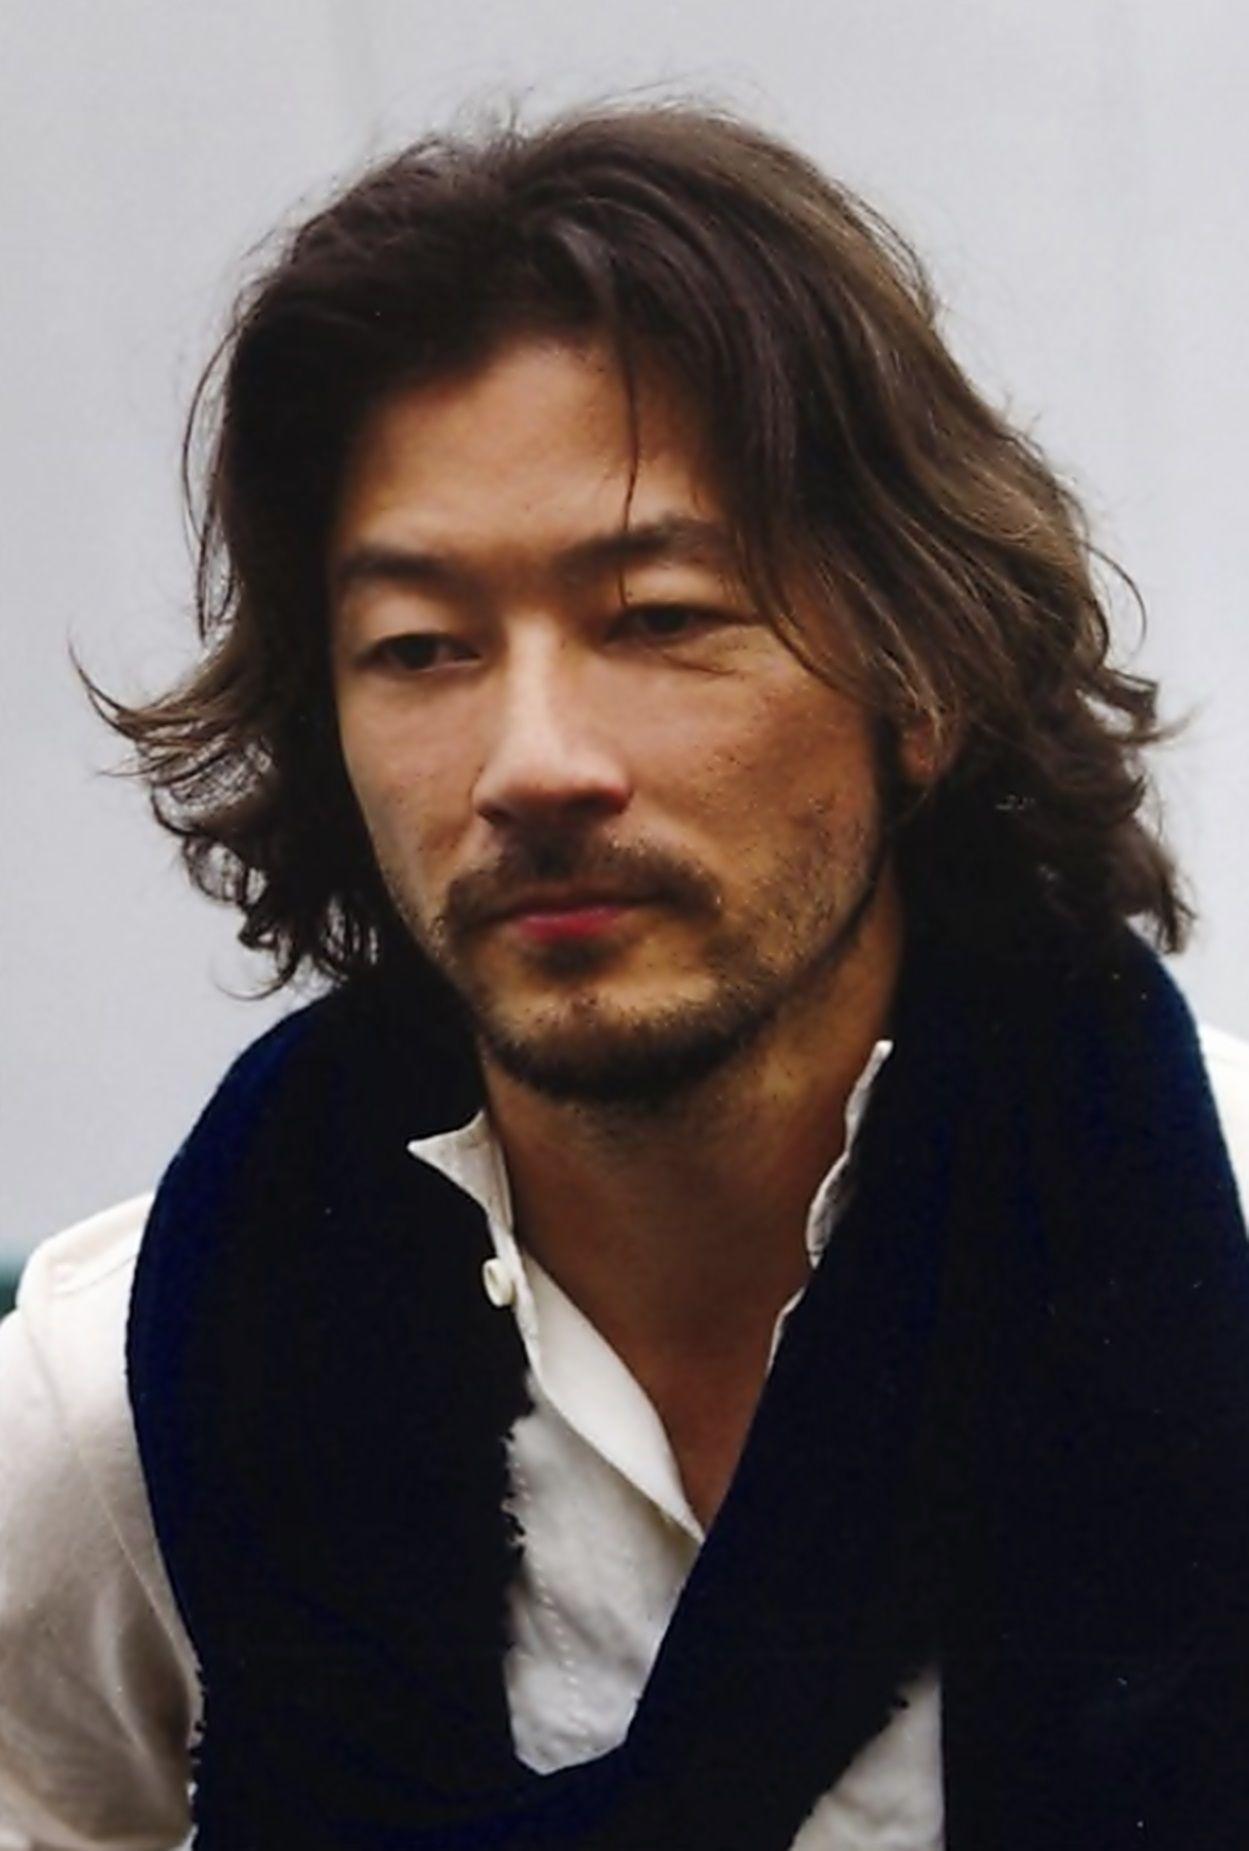 Tadanobu asano's a japanese film actor. Asano Tadanobu | Actors, Japanese film, Asian film